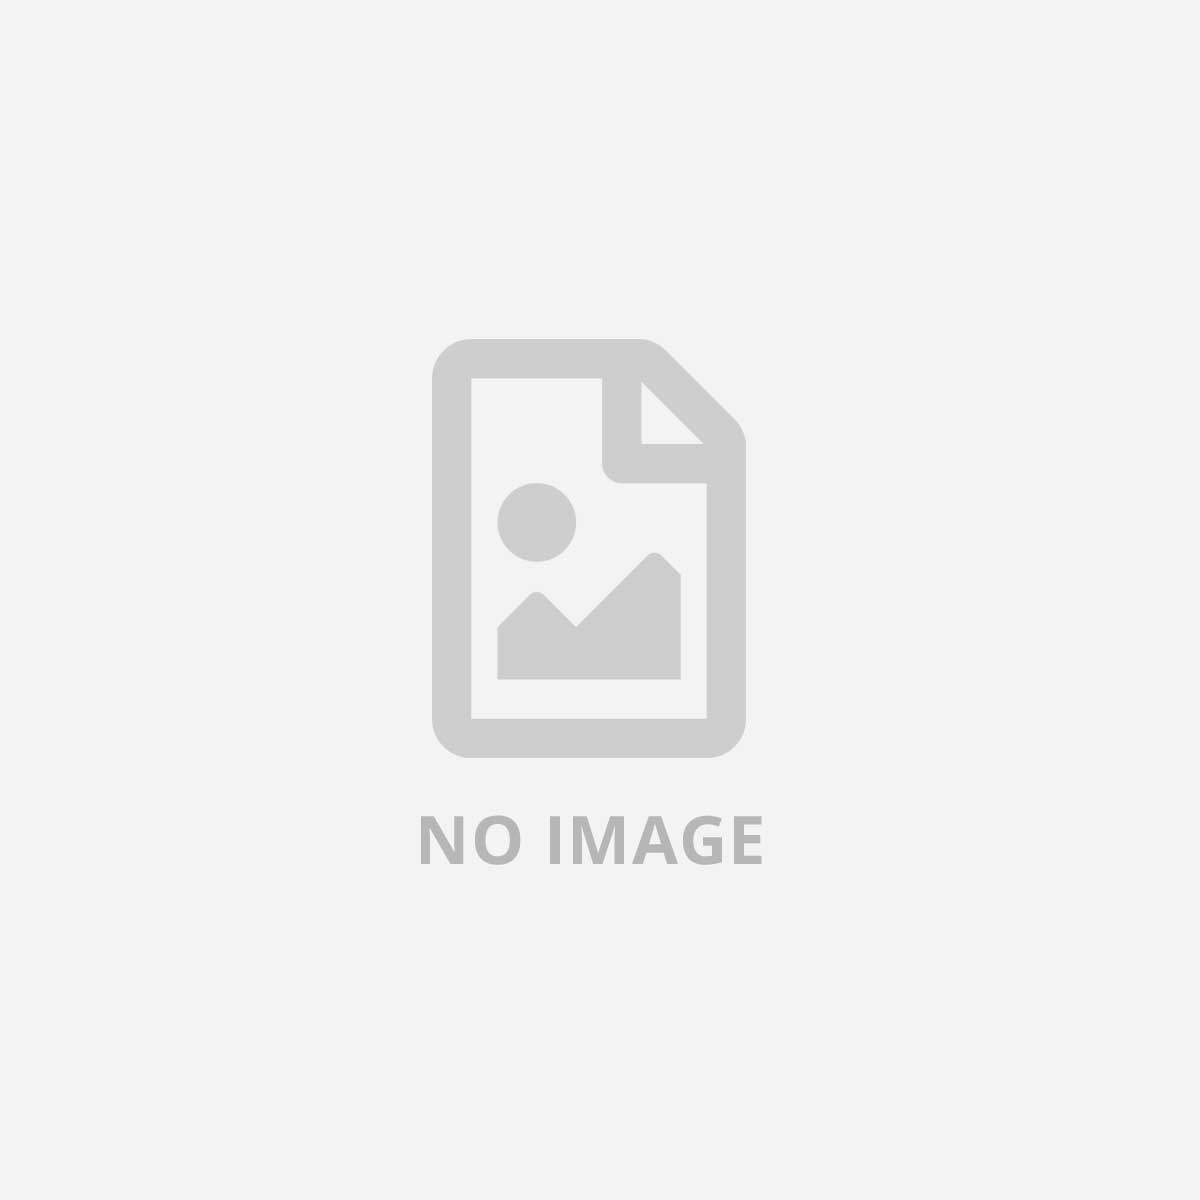 HP 60DAY WORKSPACE